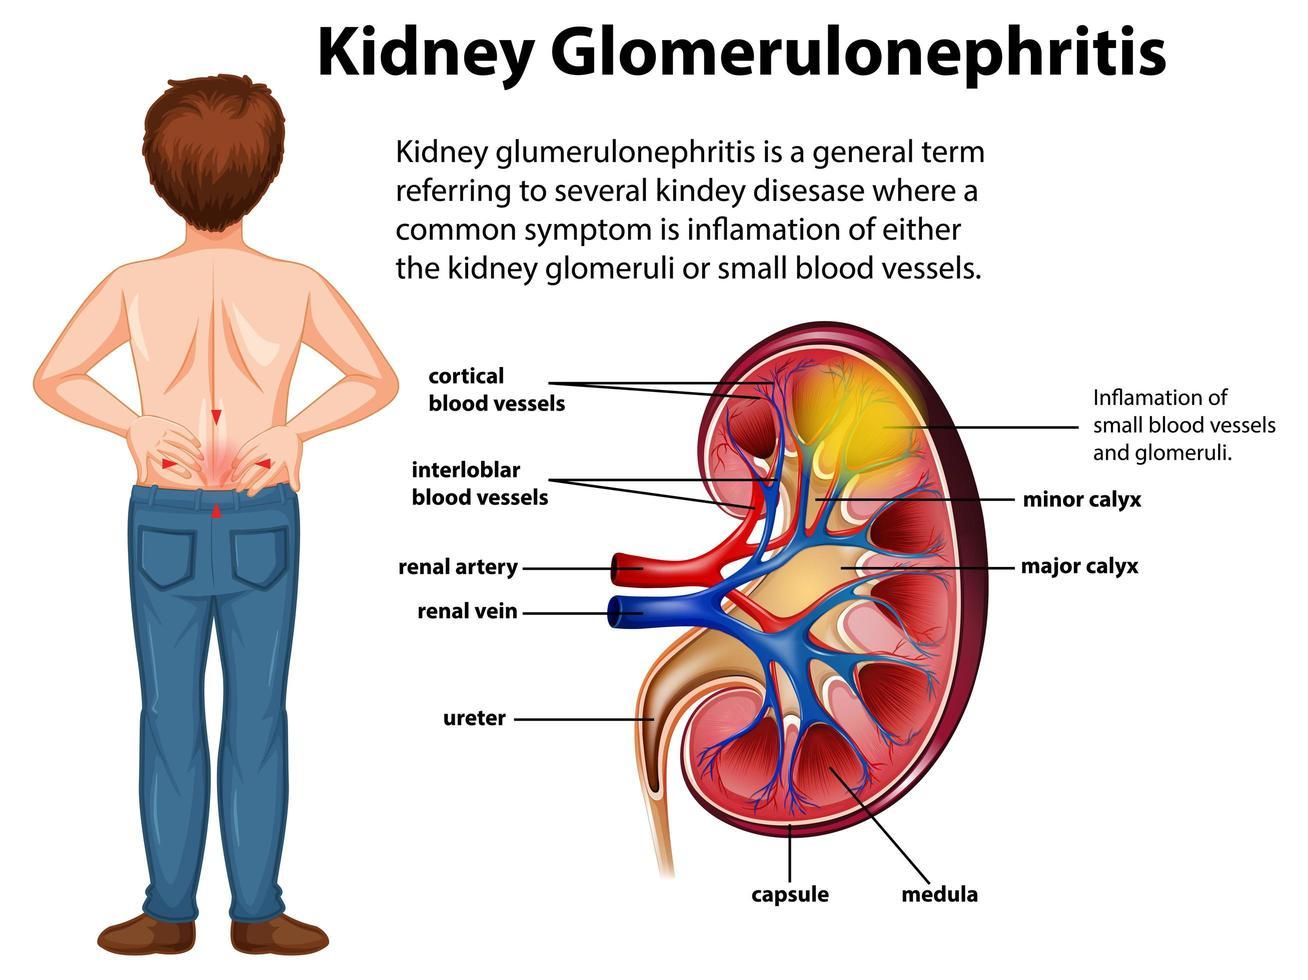 Medizinische Infografik zum Thema Nierenglomerulosklerose vektor